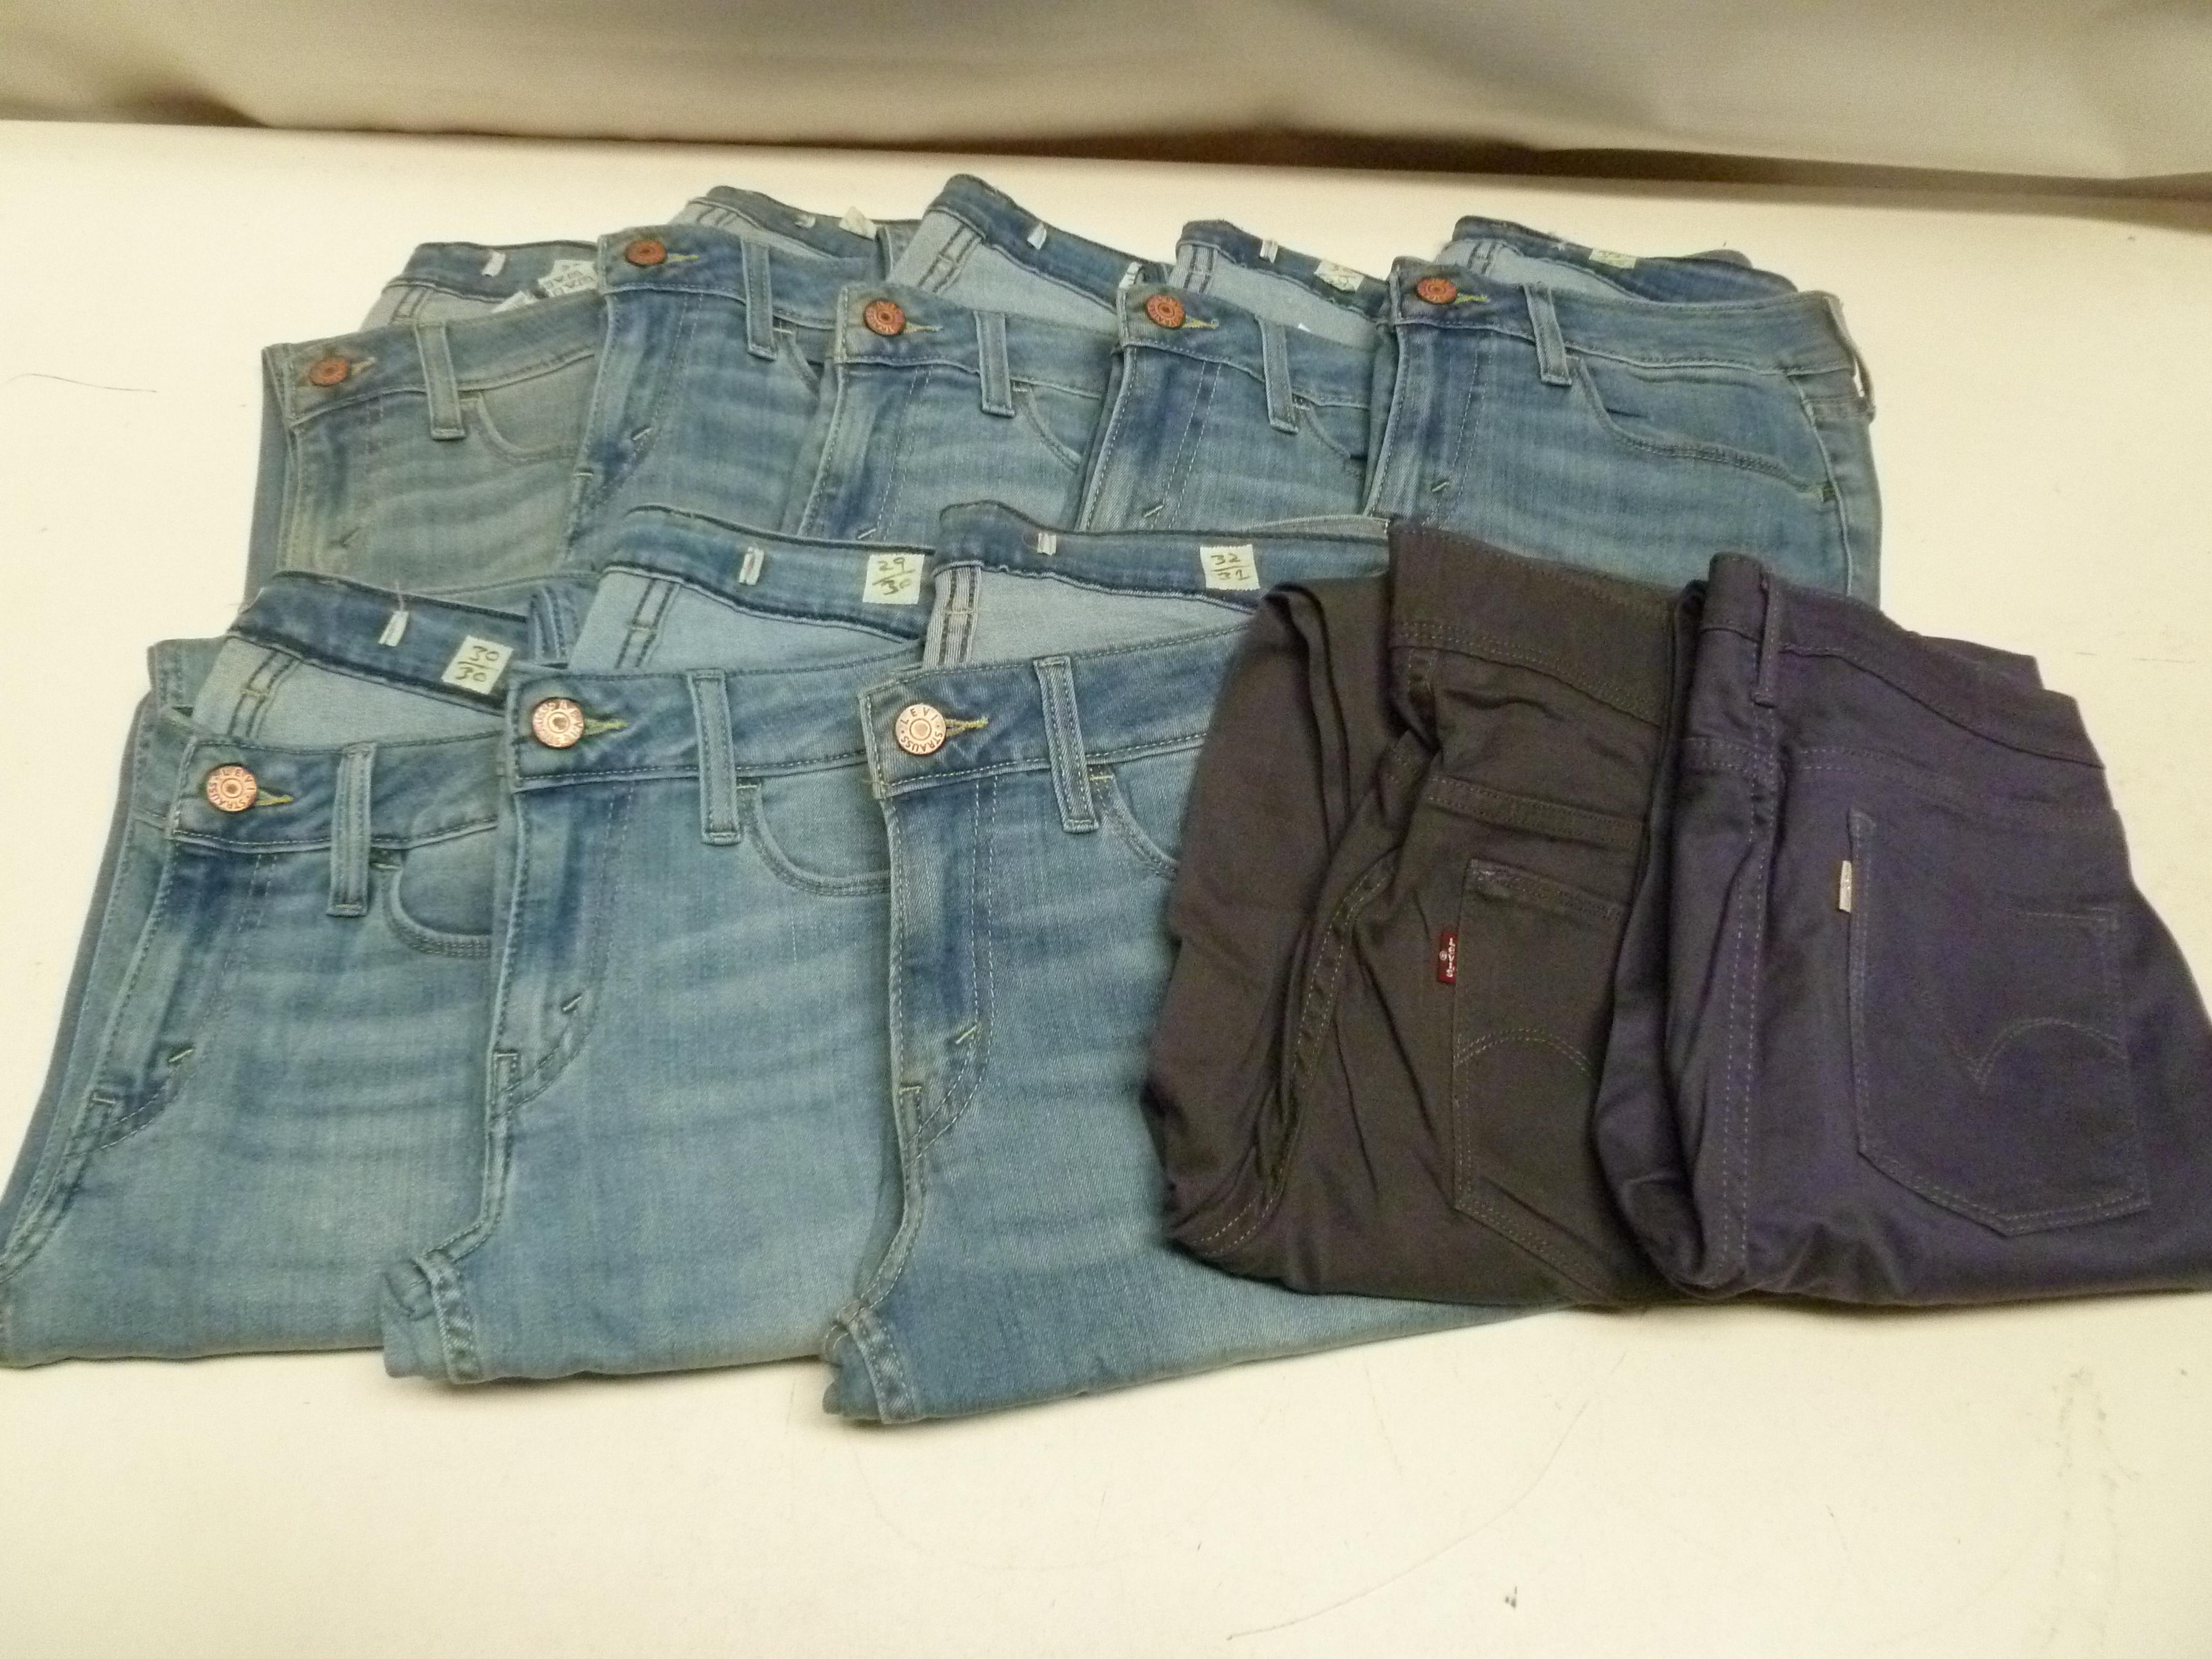 10 x Levi jeans All New ladies jeans mixed sizes all Levis Bulk Job Lot Wholesale Lot 2